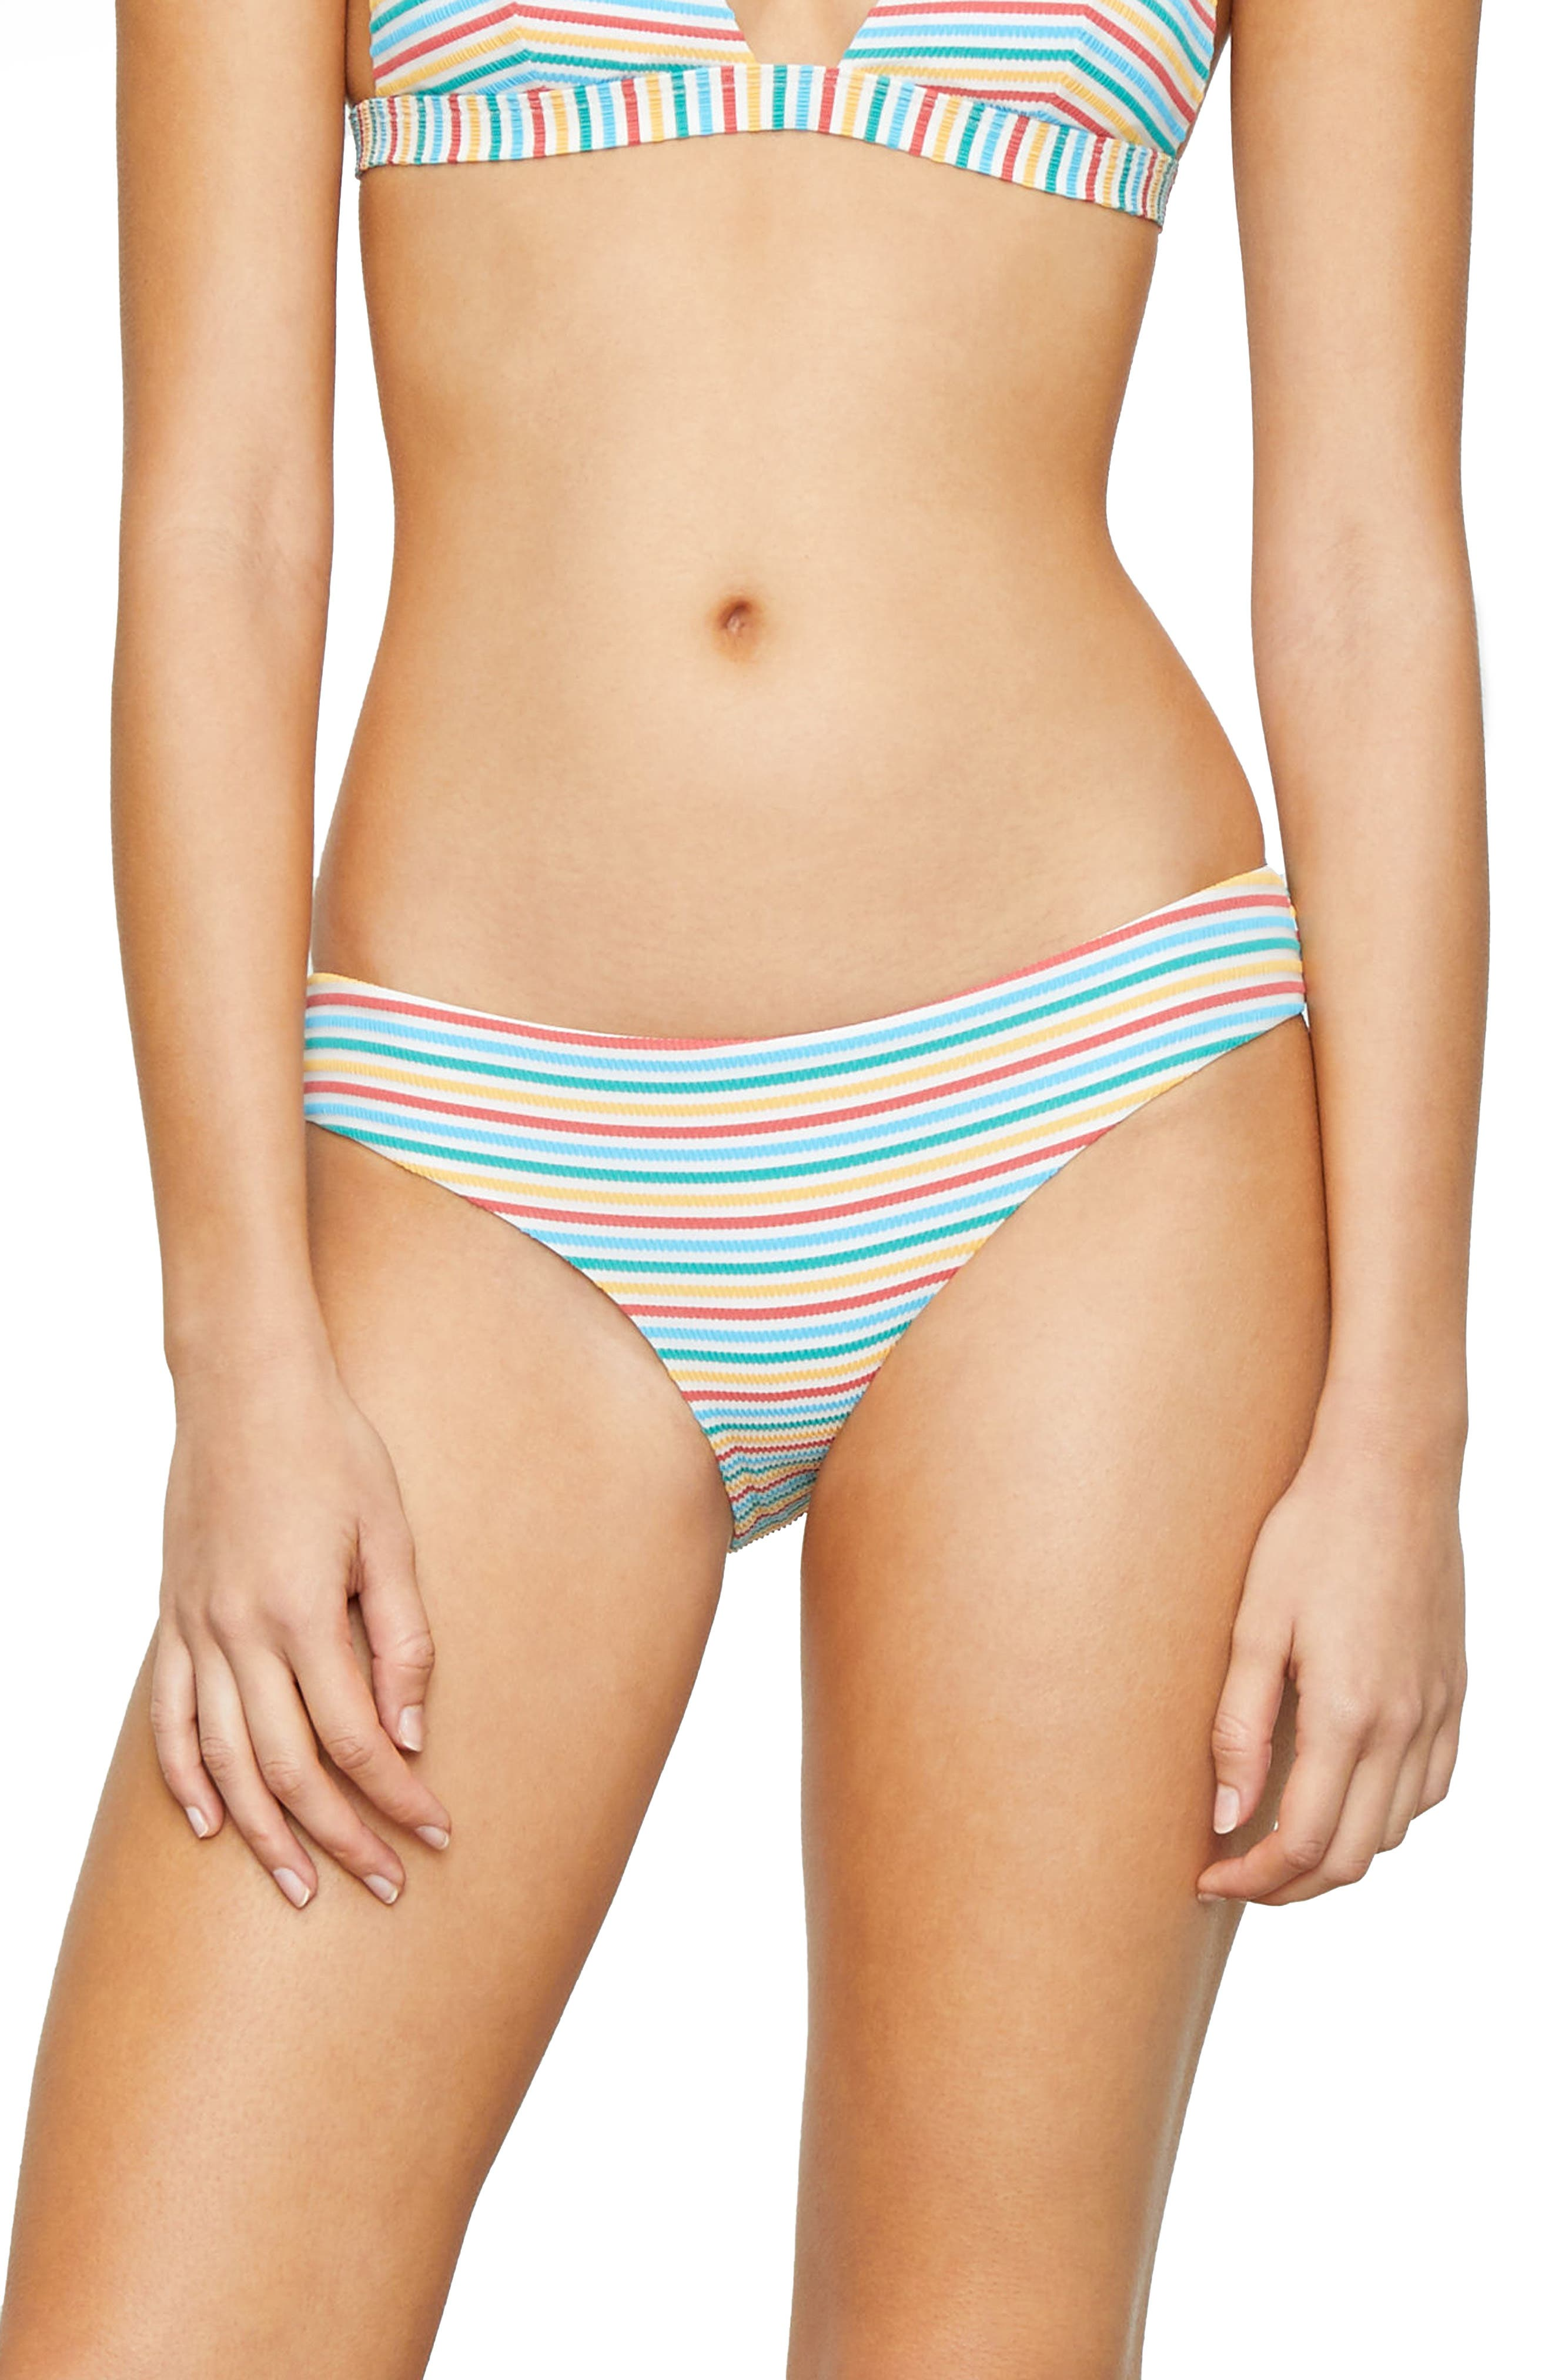 Stripe Bikini Bottoms,                         Main,                         color, Yellow/ Blue/ Red